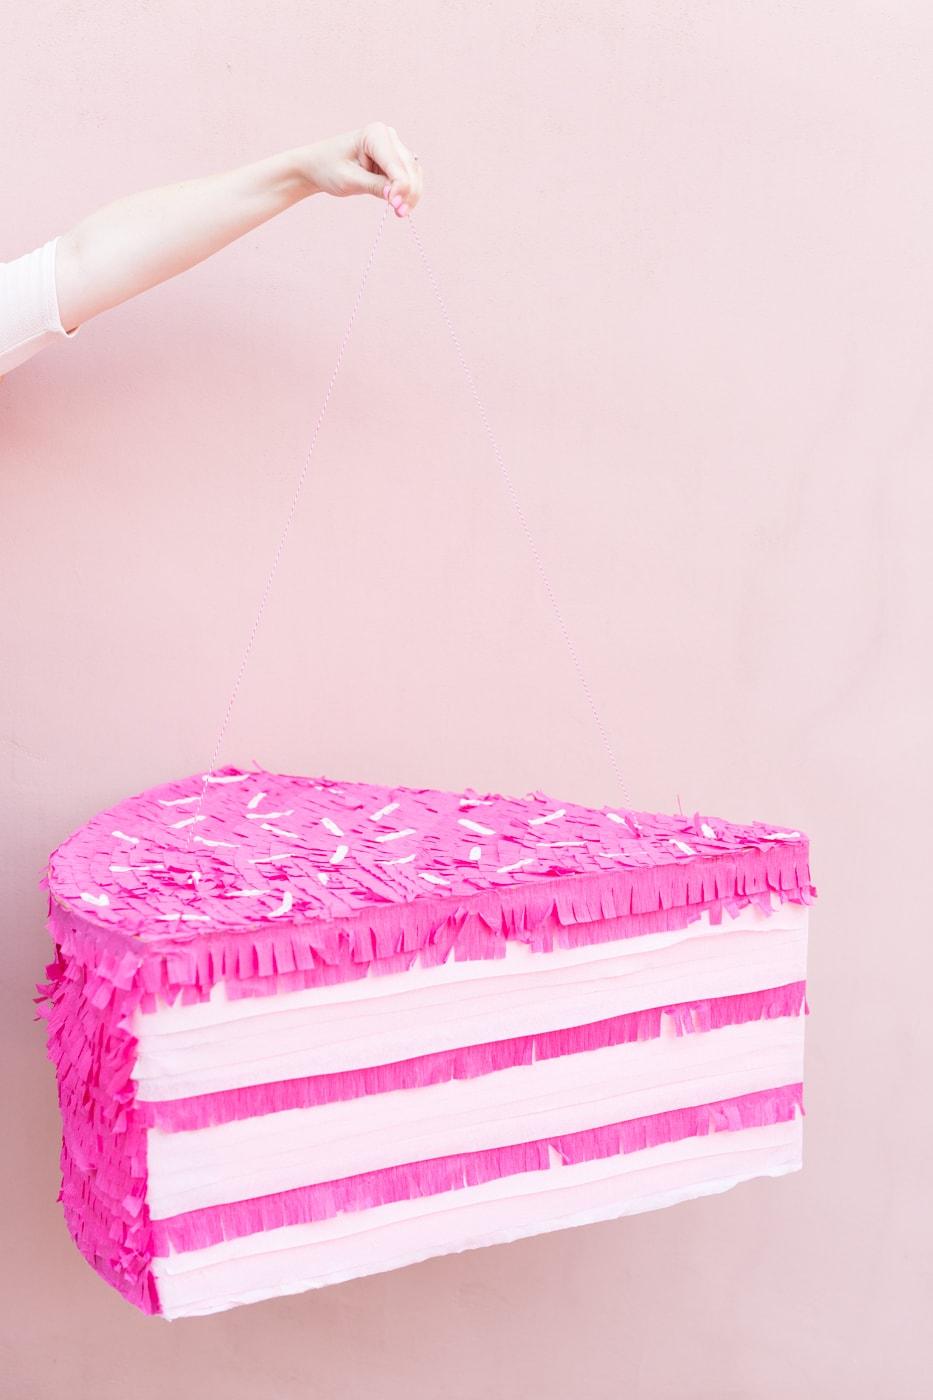 Marvelous Diy Giant Pink Birthday Cake Slice Pinata Best Friends For Frosting Funny Birthday Cards Online Elaedamsfinfo